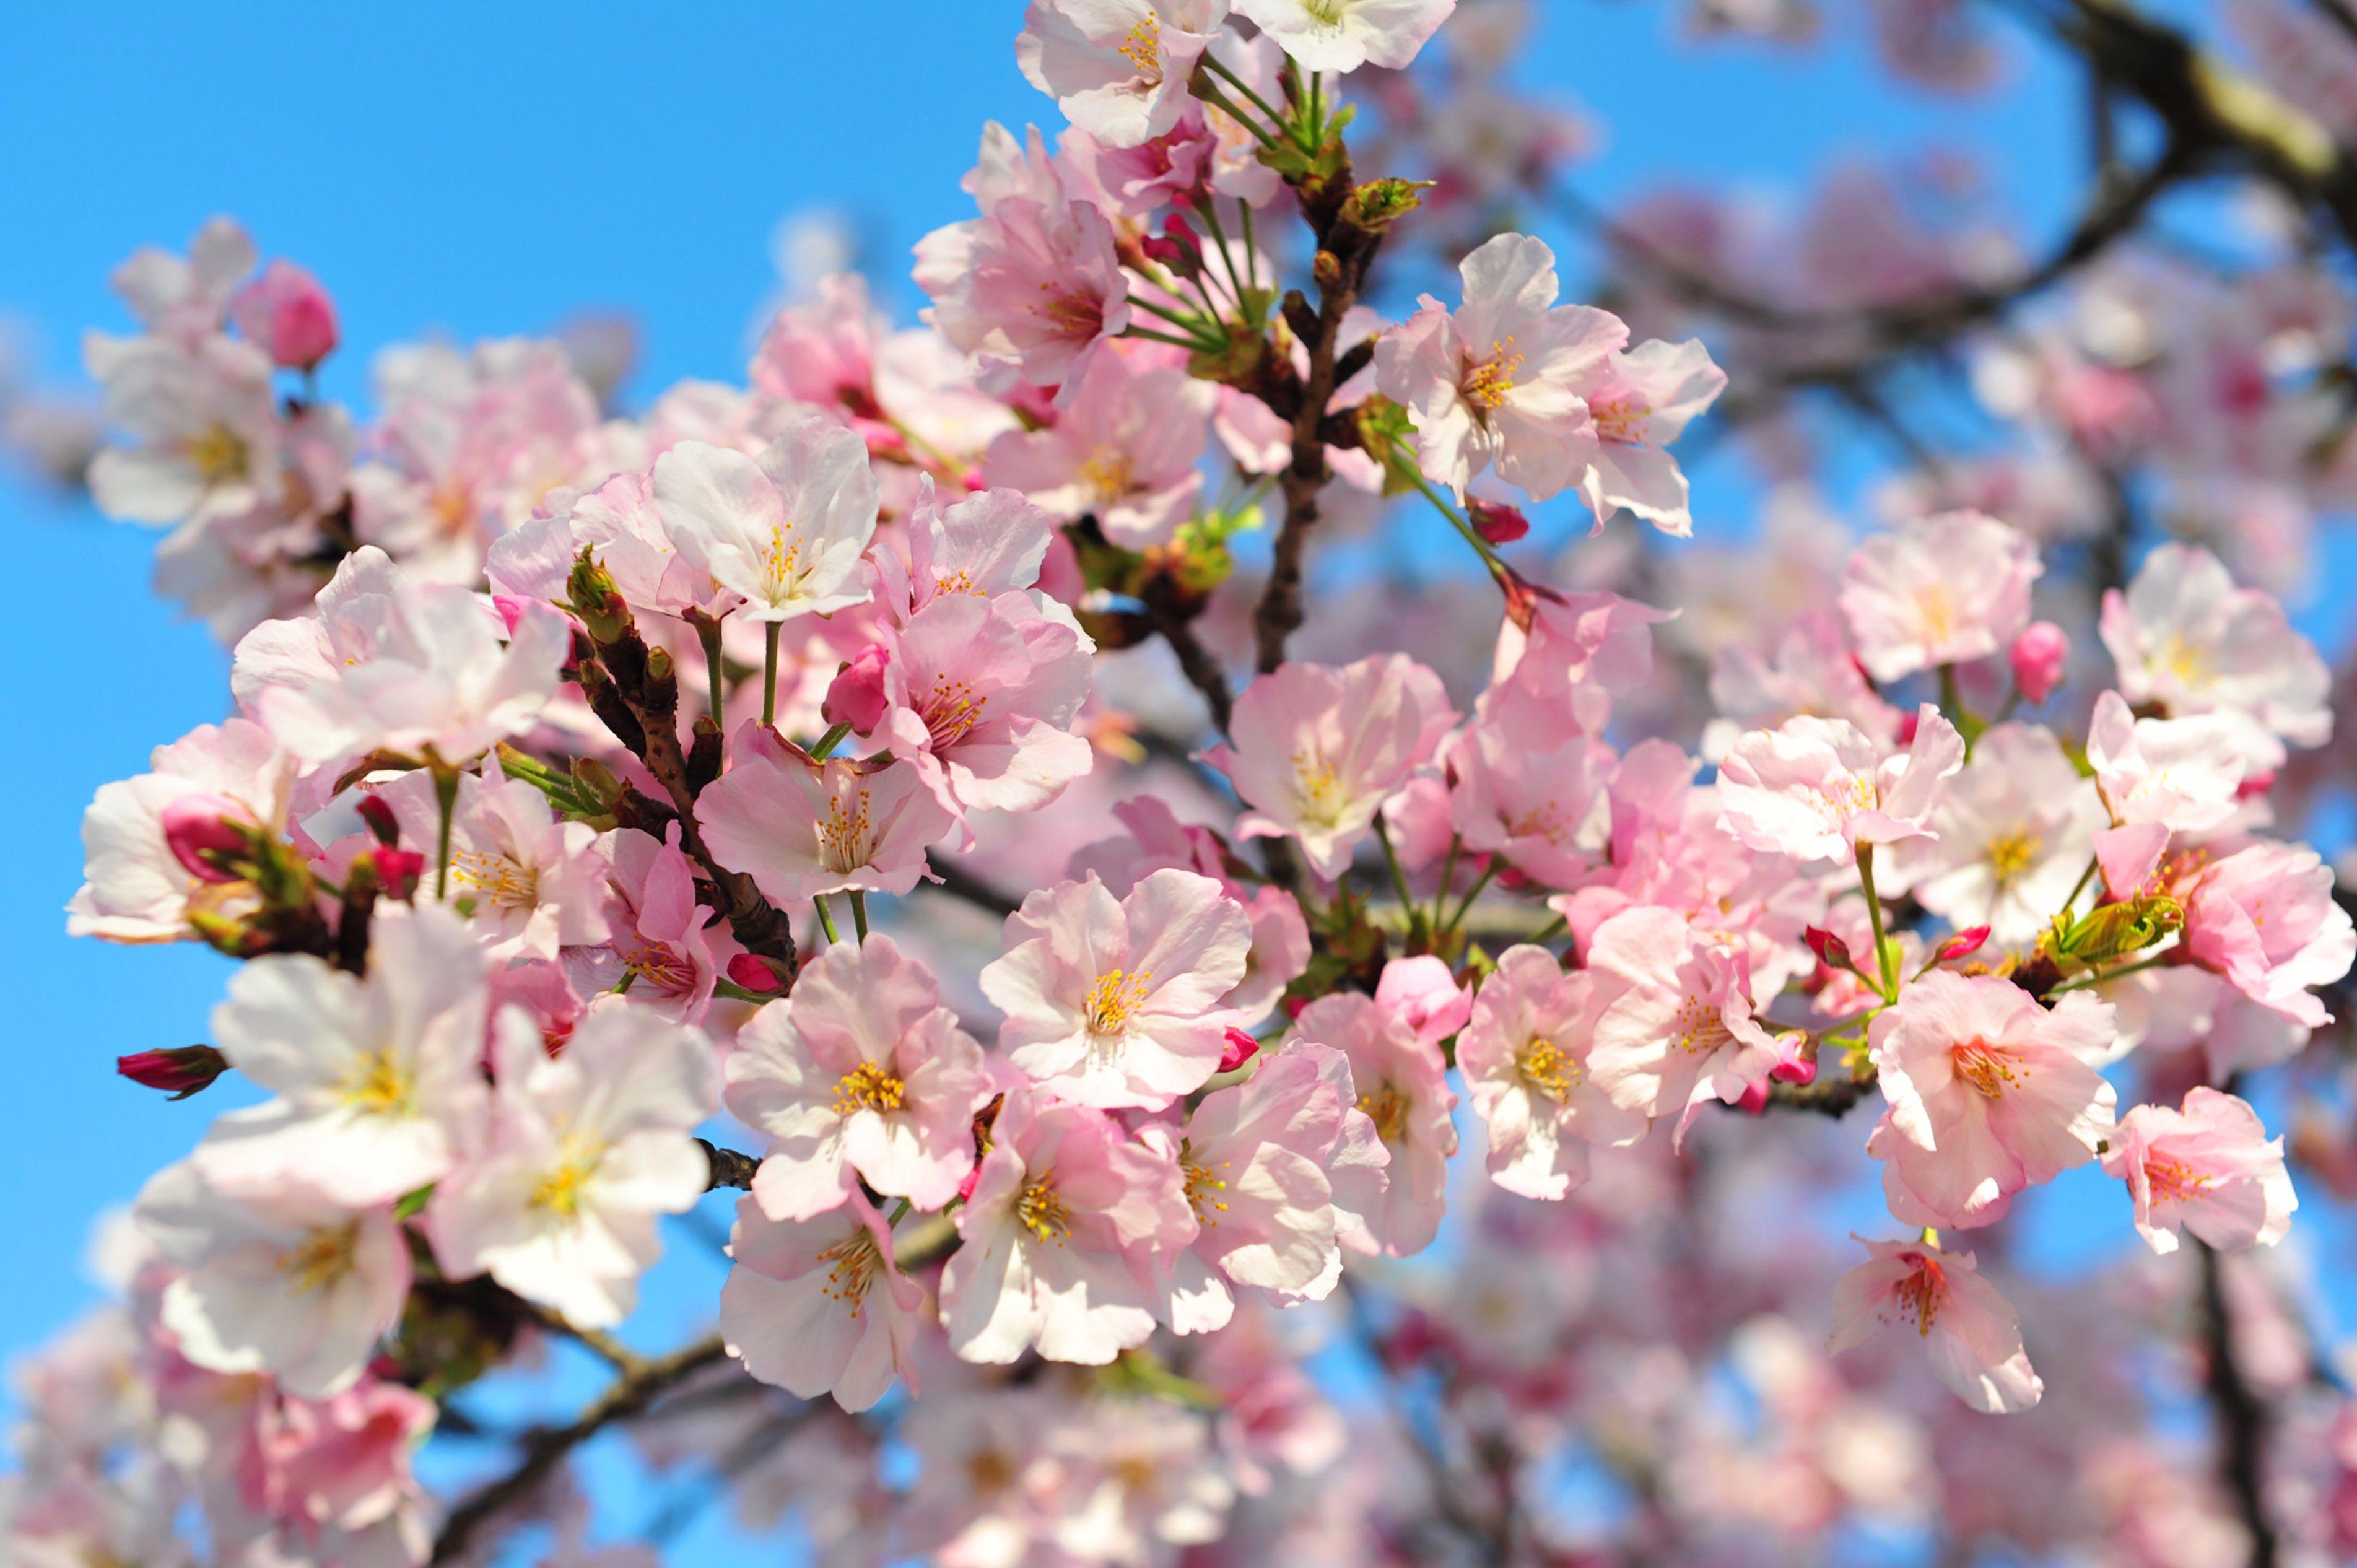 Springtime S Cherry Blossoms Have A Dark Side Small Garden Design Small Garden Cherry Blossom